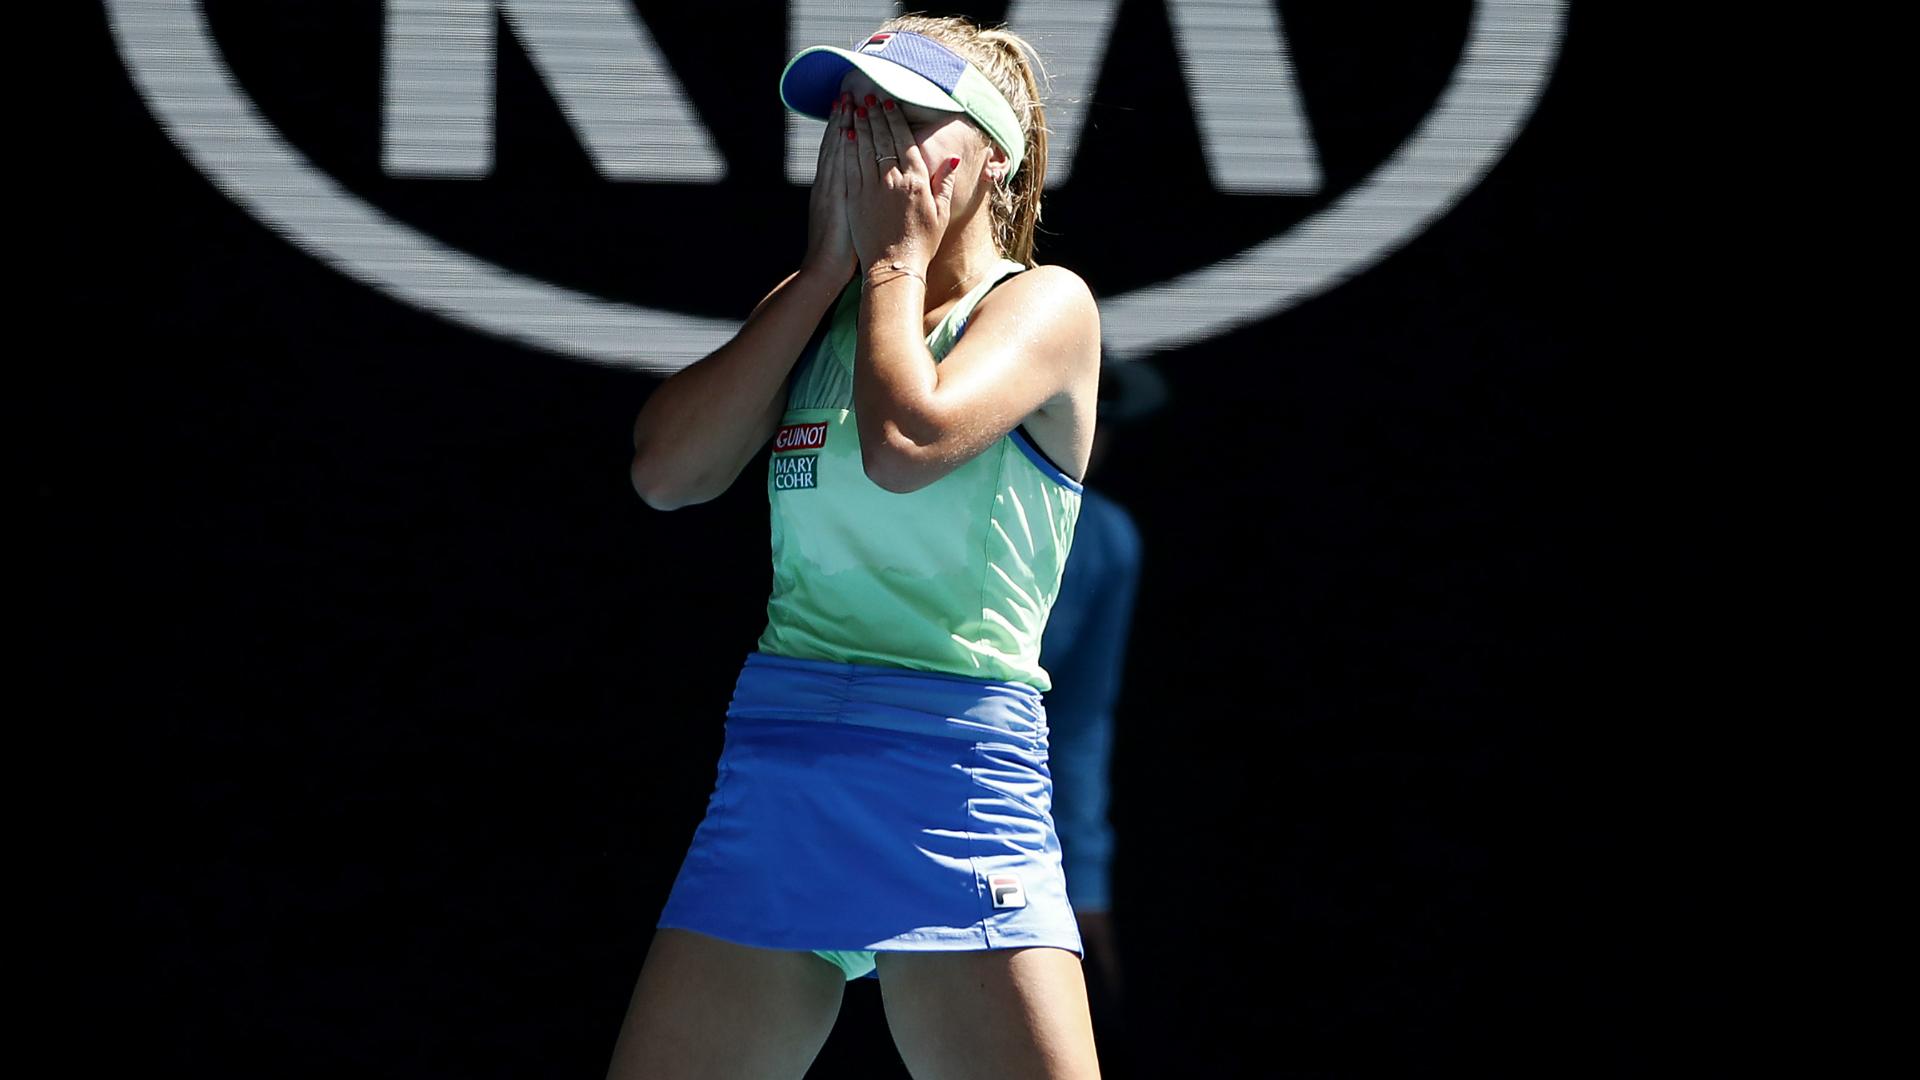 Australian Open 2020: Kenin says she always believed as first grand slam final awaits